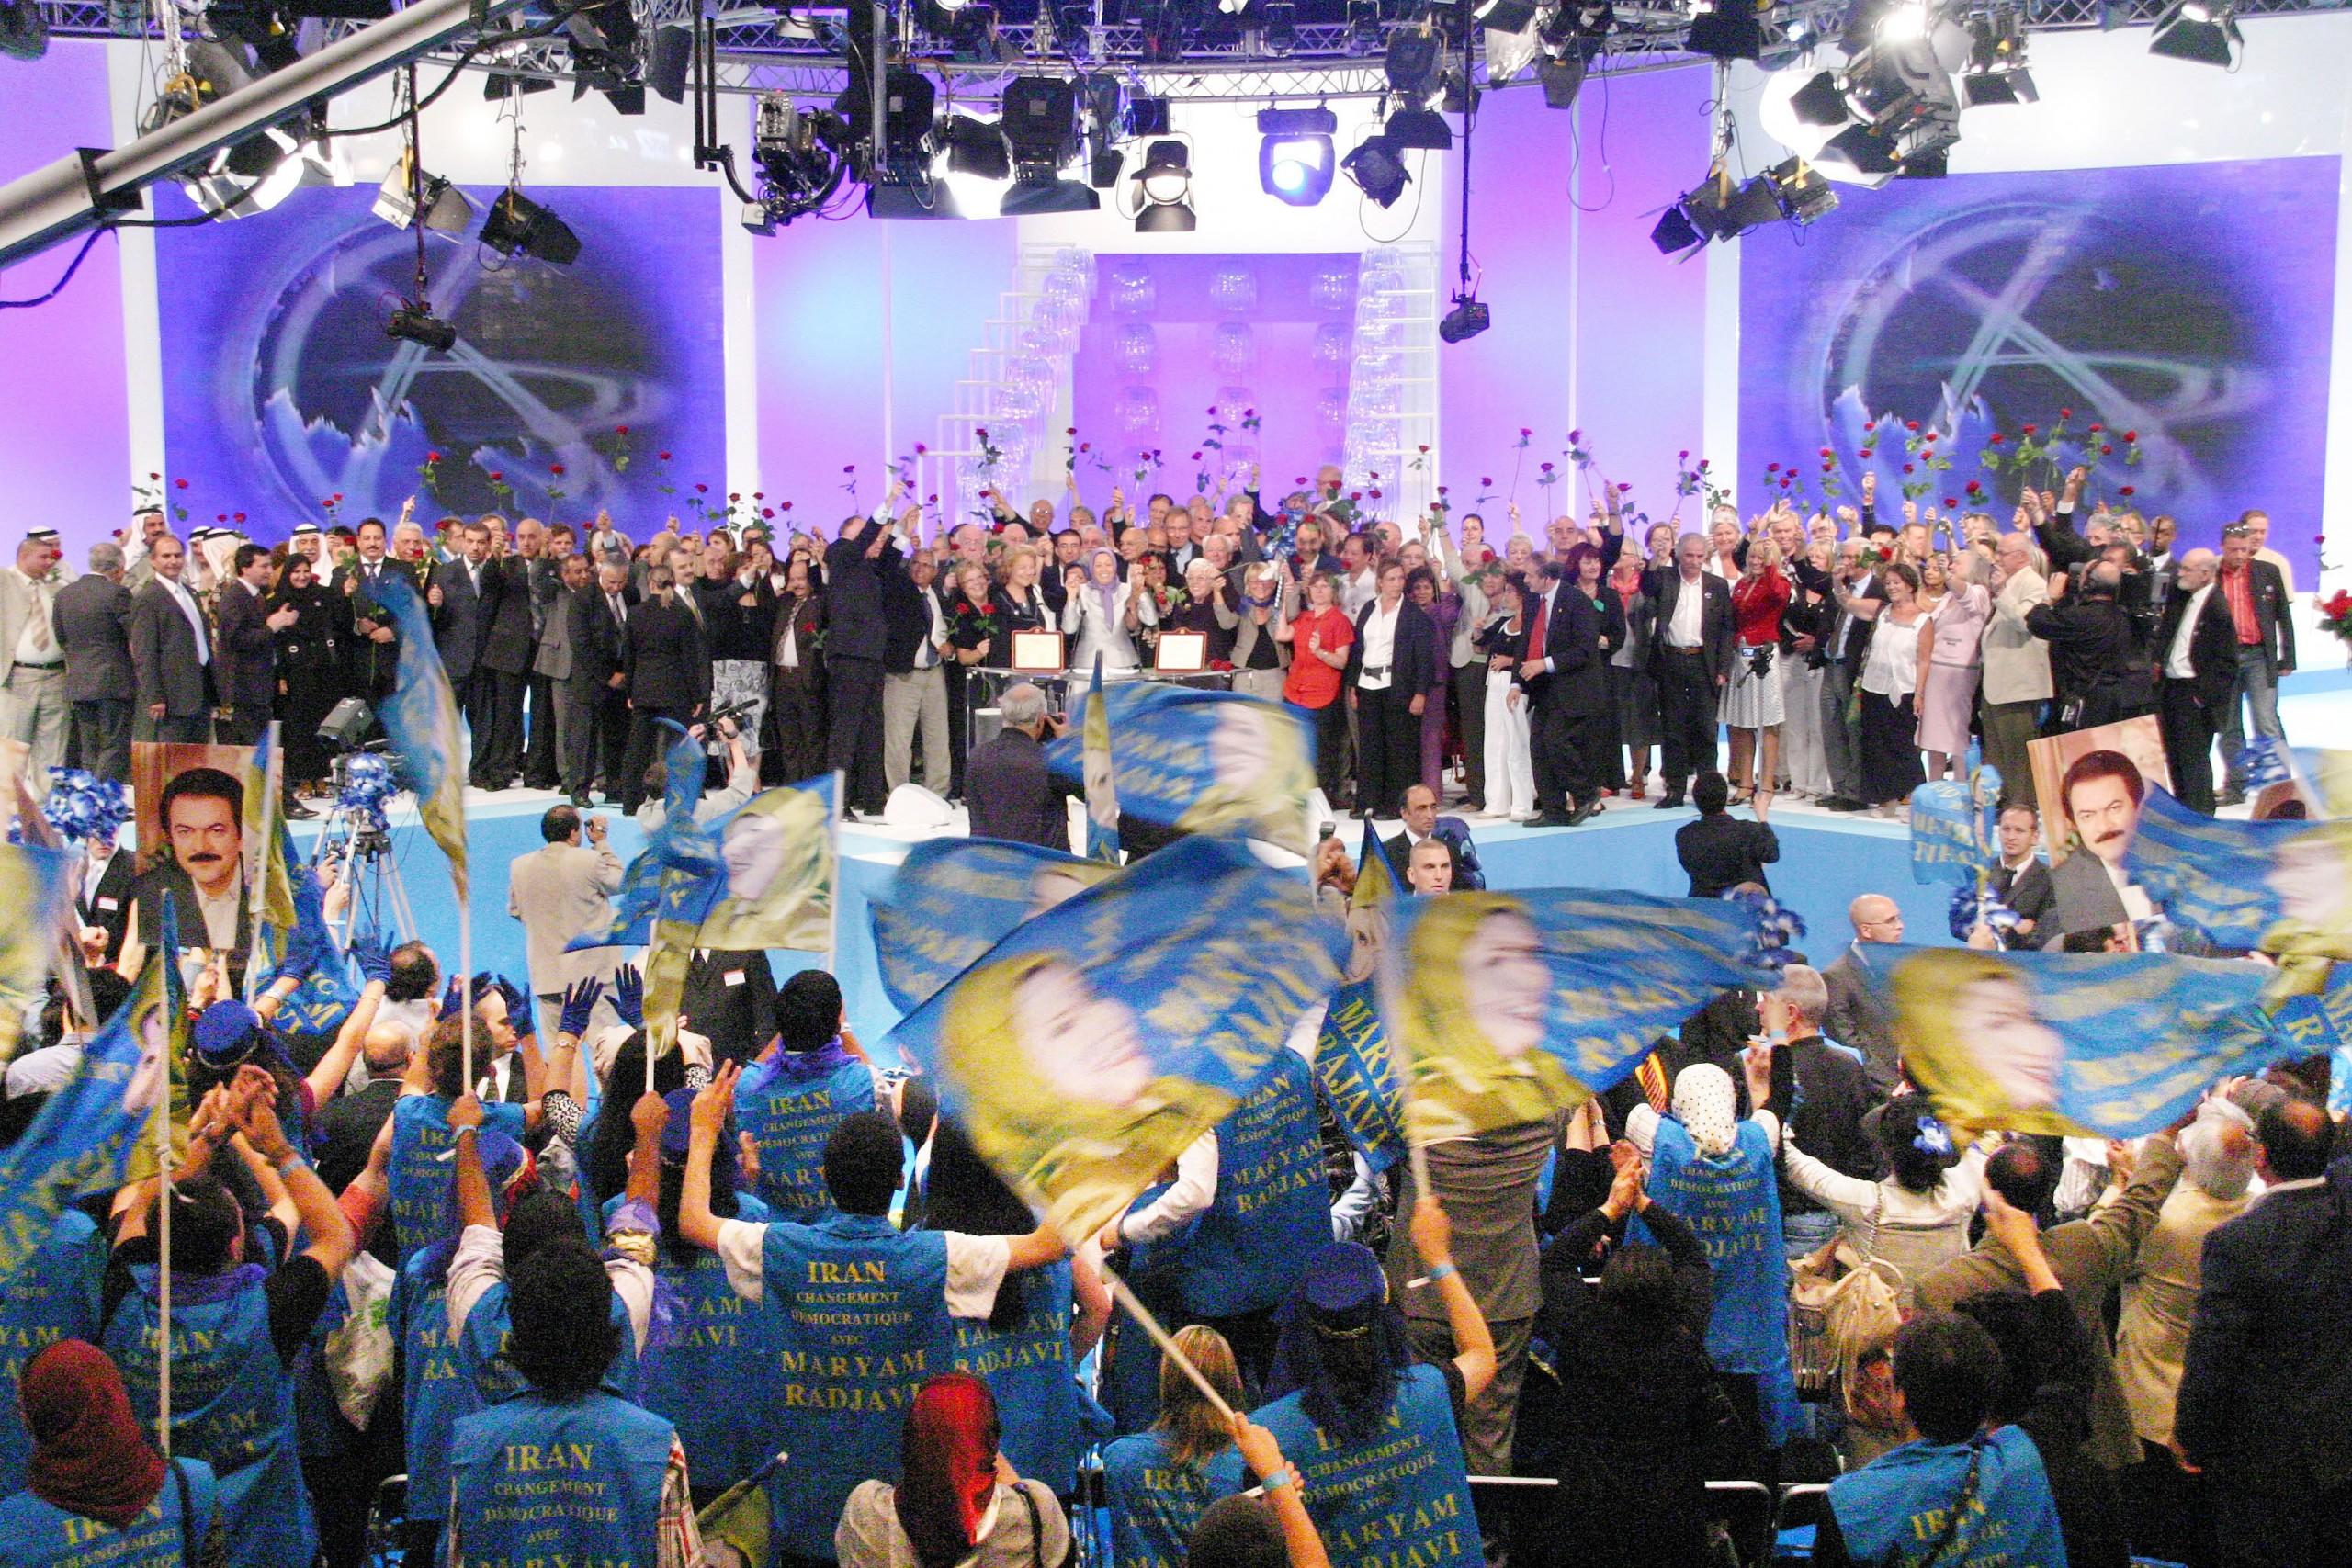 Maryam Rajavi's speech in gathering of 70,000 Iranians in Paris